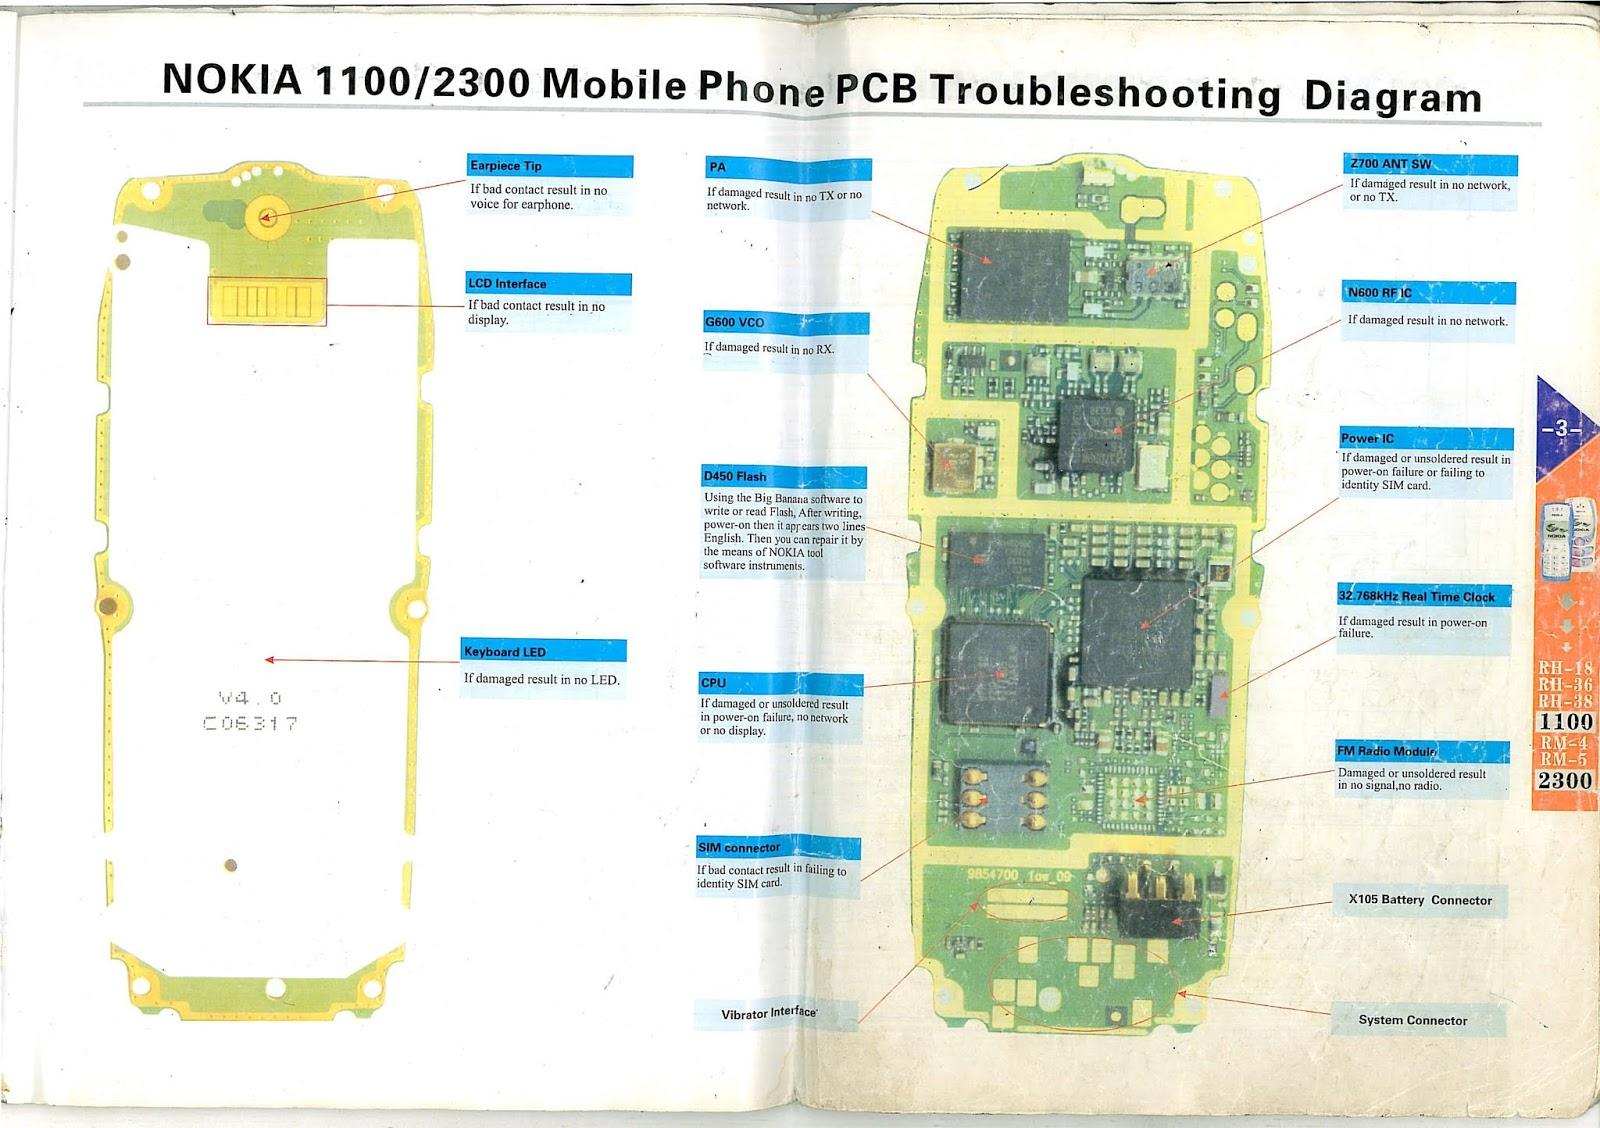 circuit diagram nokia 1100 wiring diagram forward circuit diagram nokia 1100 [ 1600 x 1128 Pixel ]